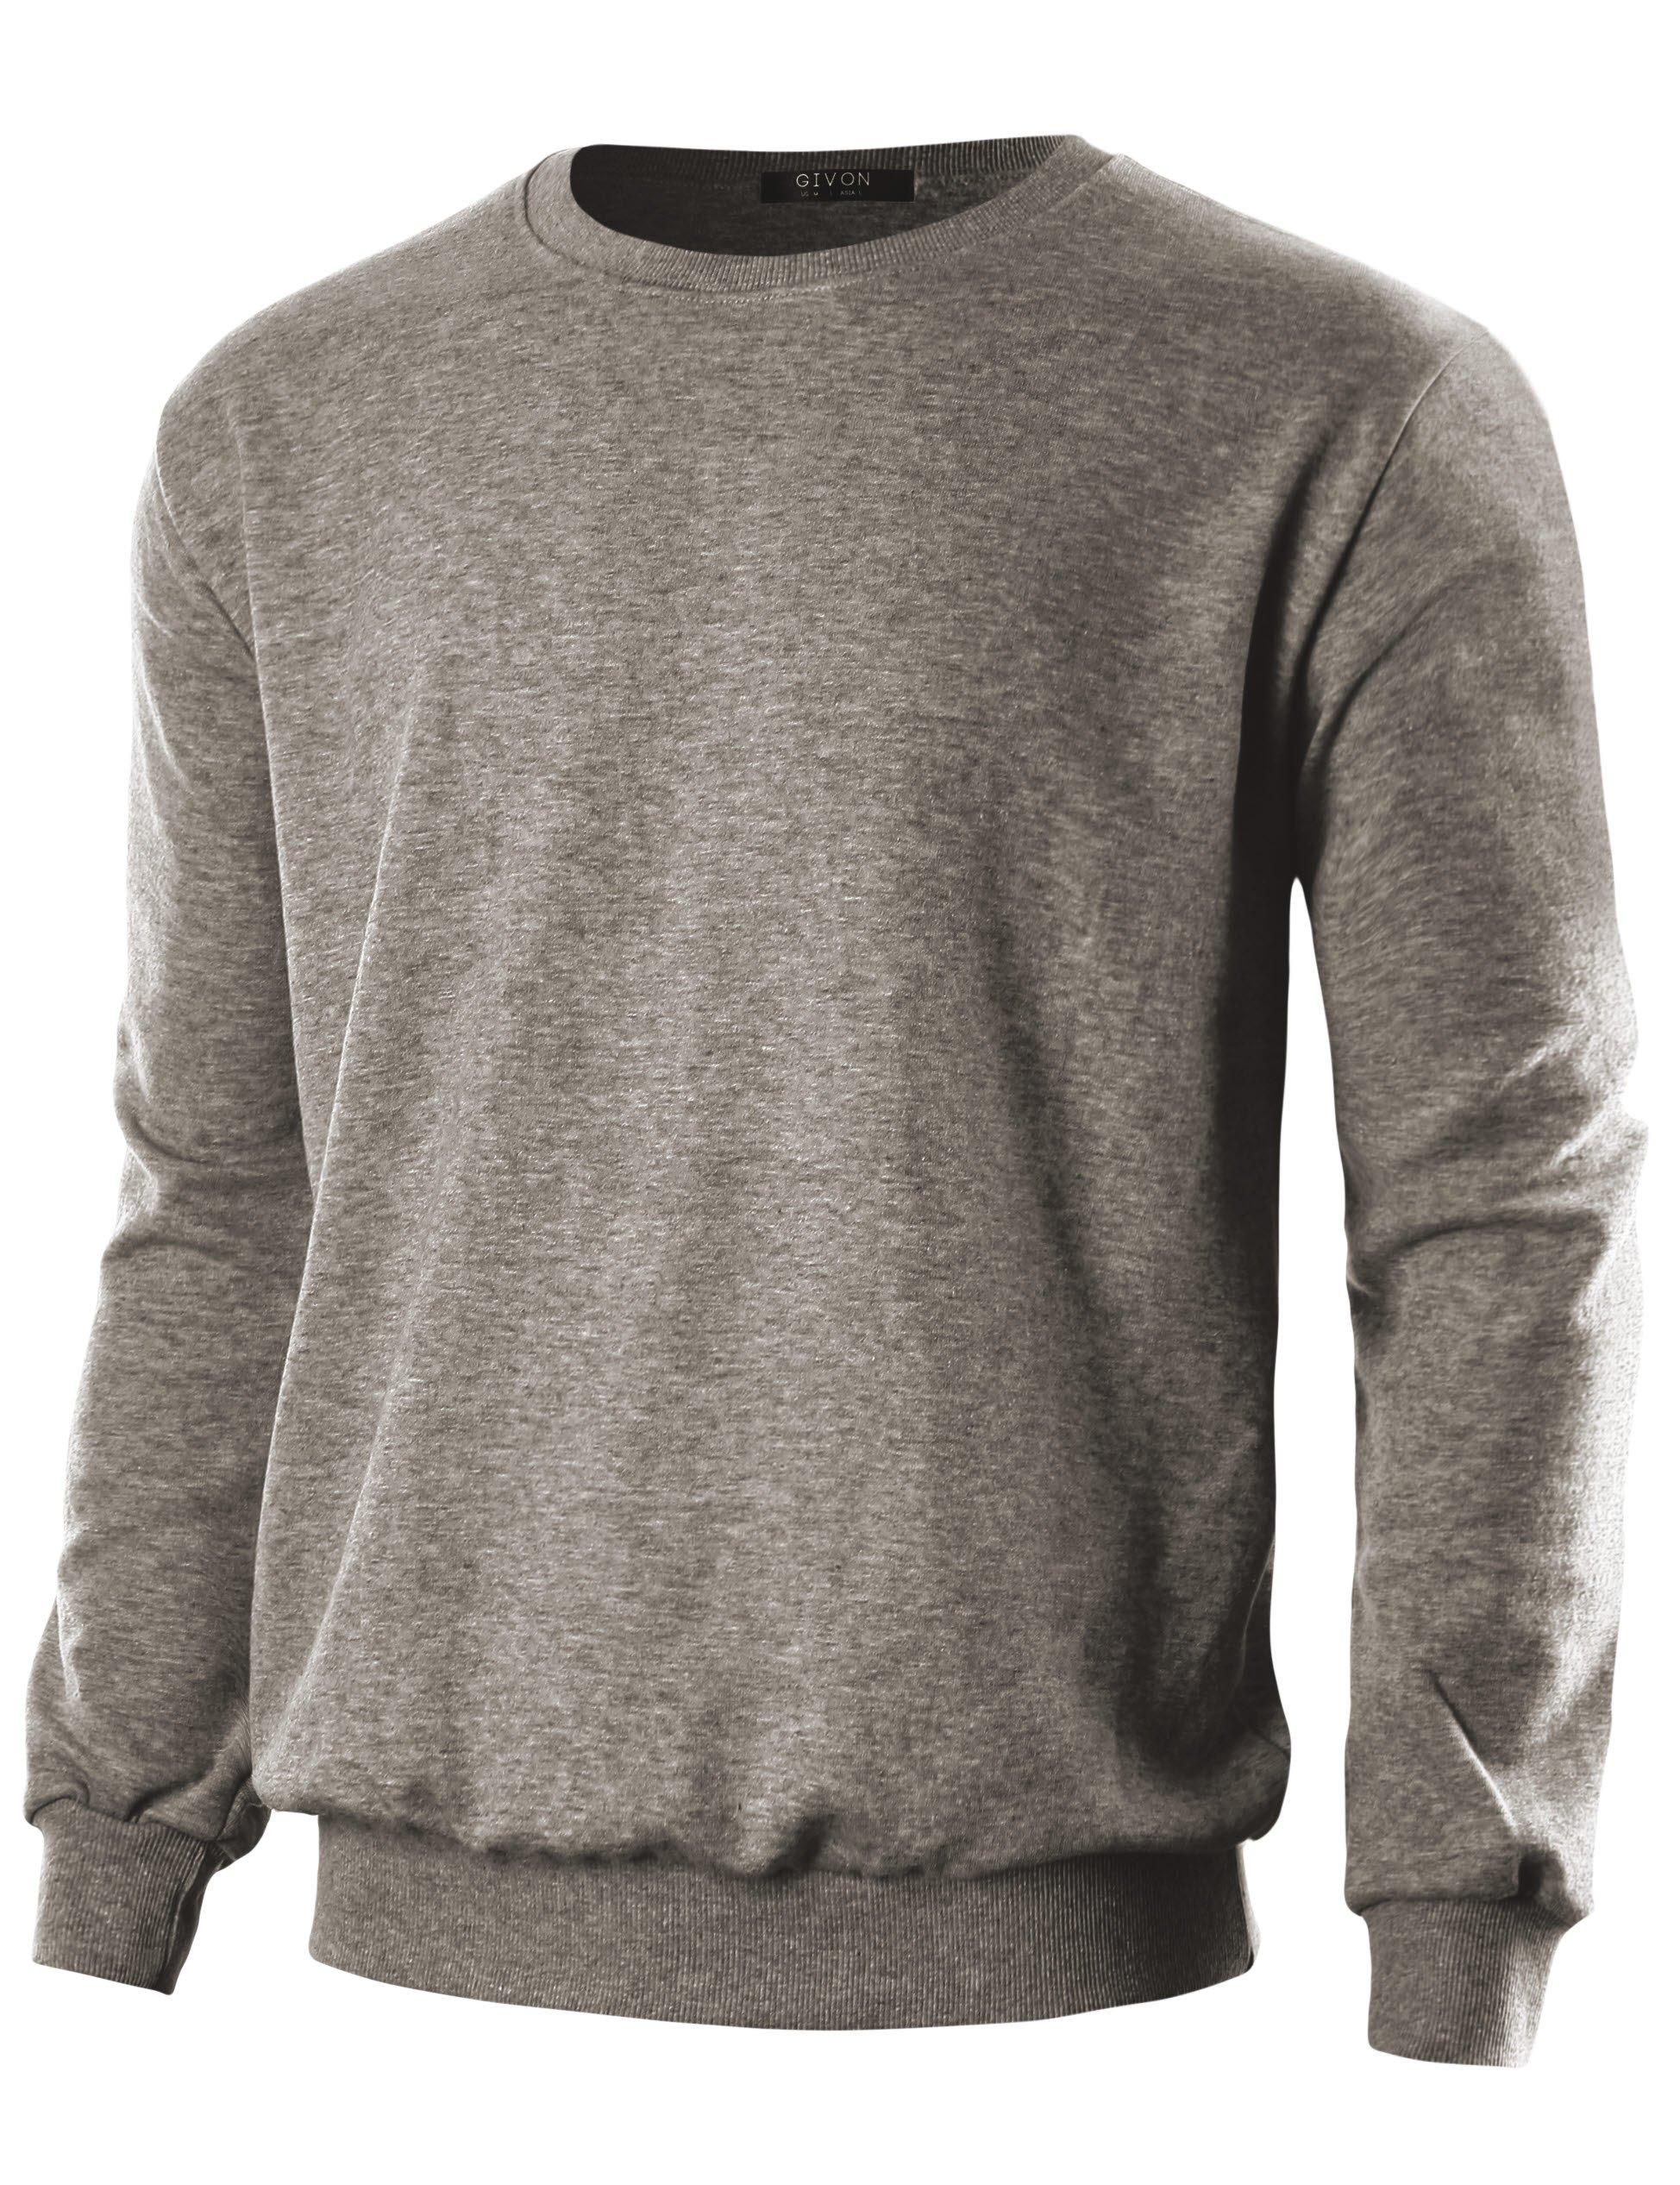 GIVON Mens Slim Fit Lightweight Crew Neck Sweatshirt/DCS005-BROWN-L